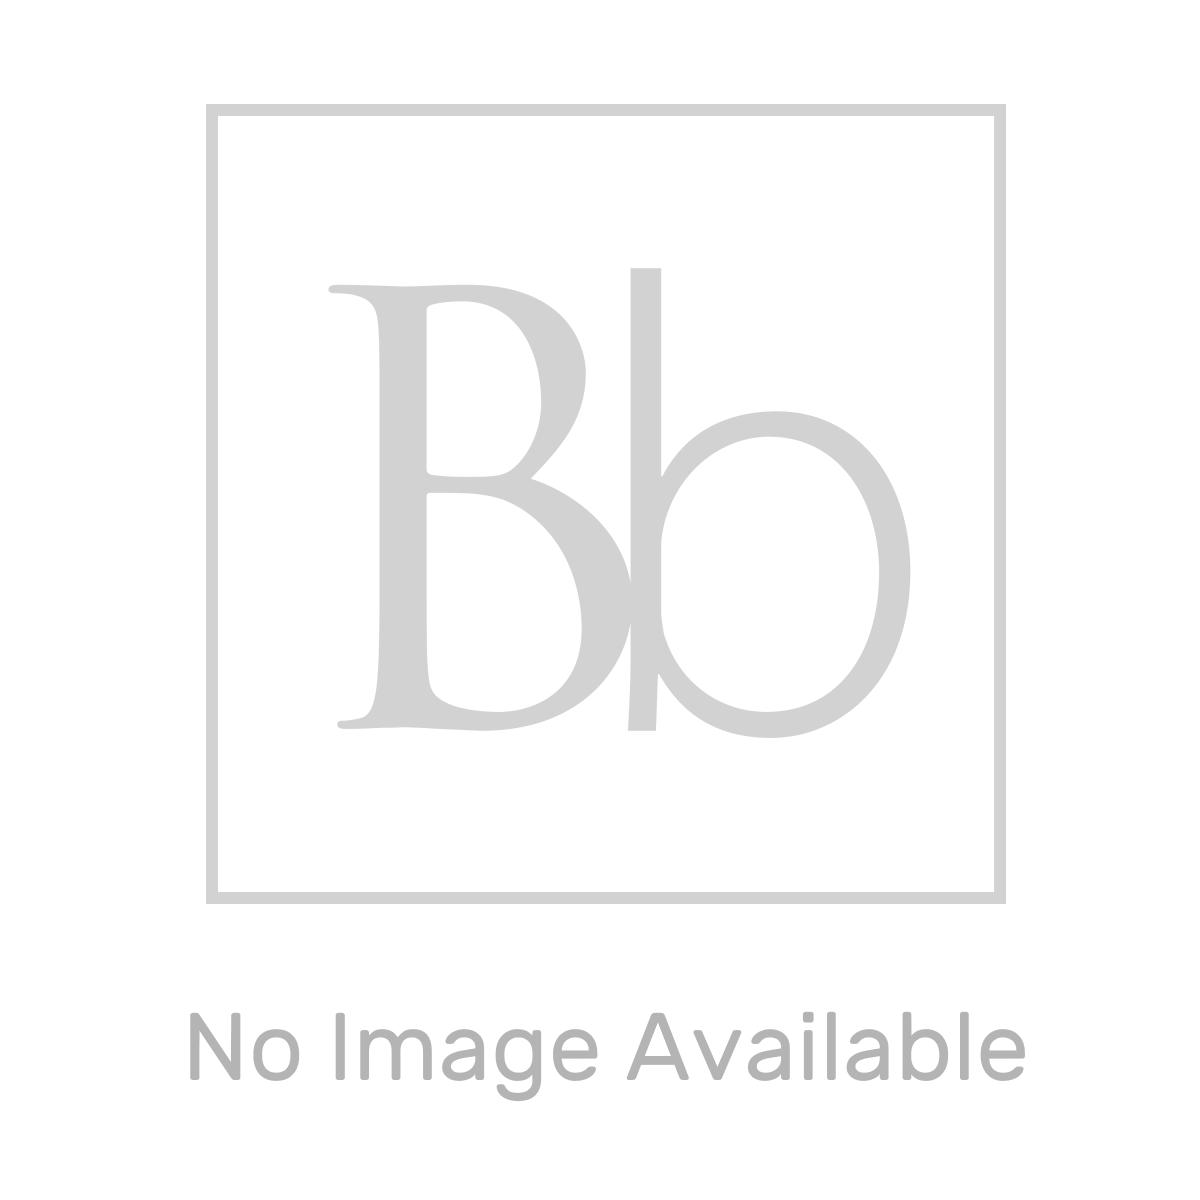 Aquadart White Slate Shower Tray 1600 x 700